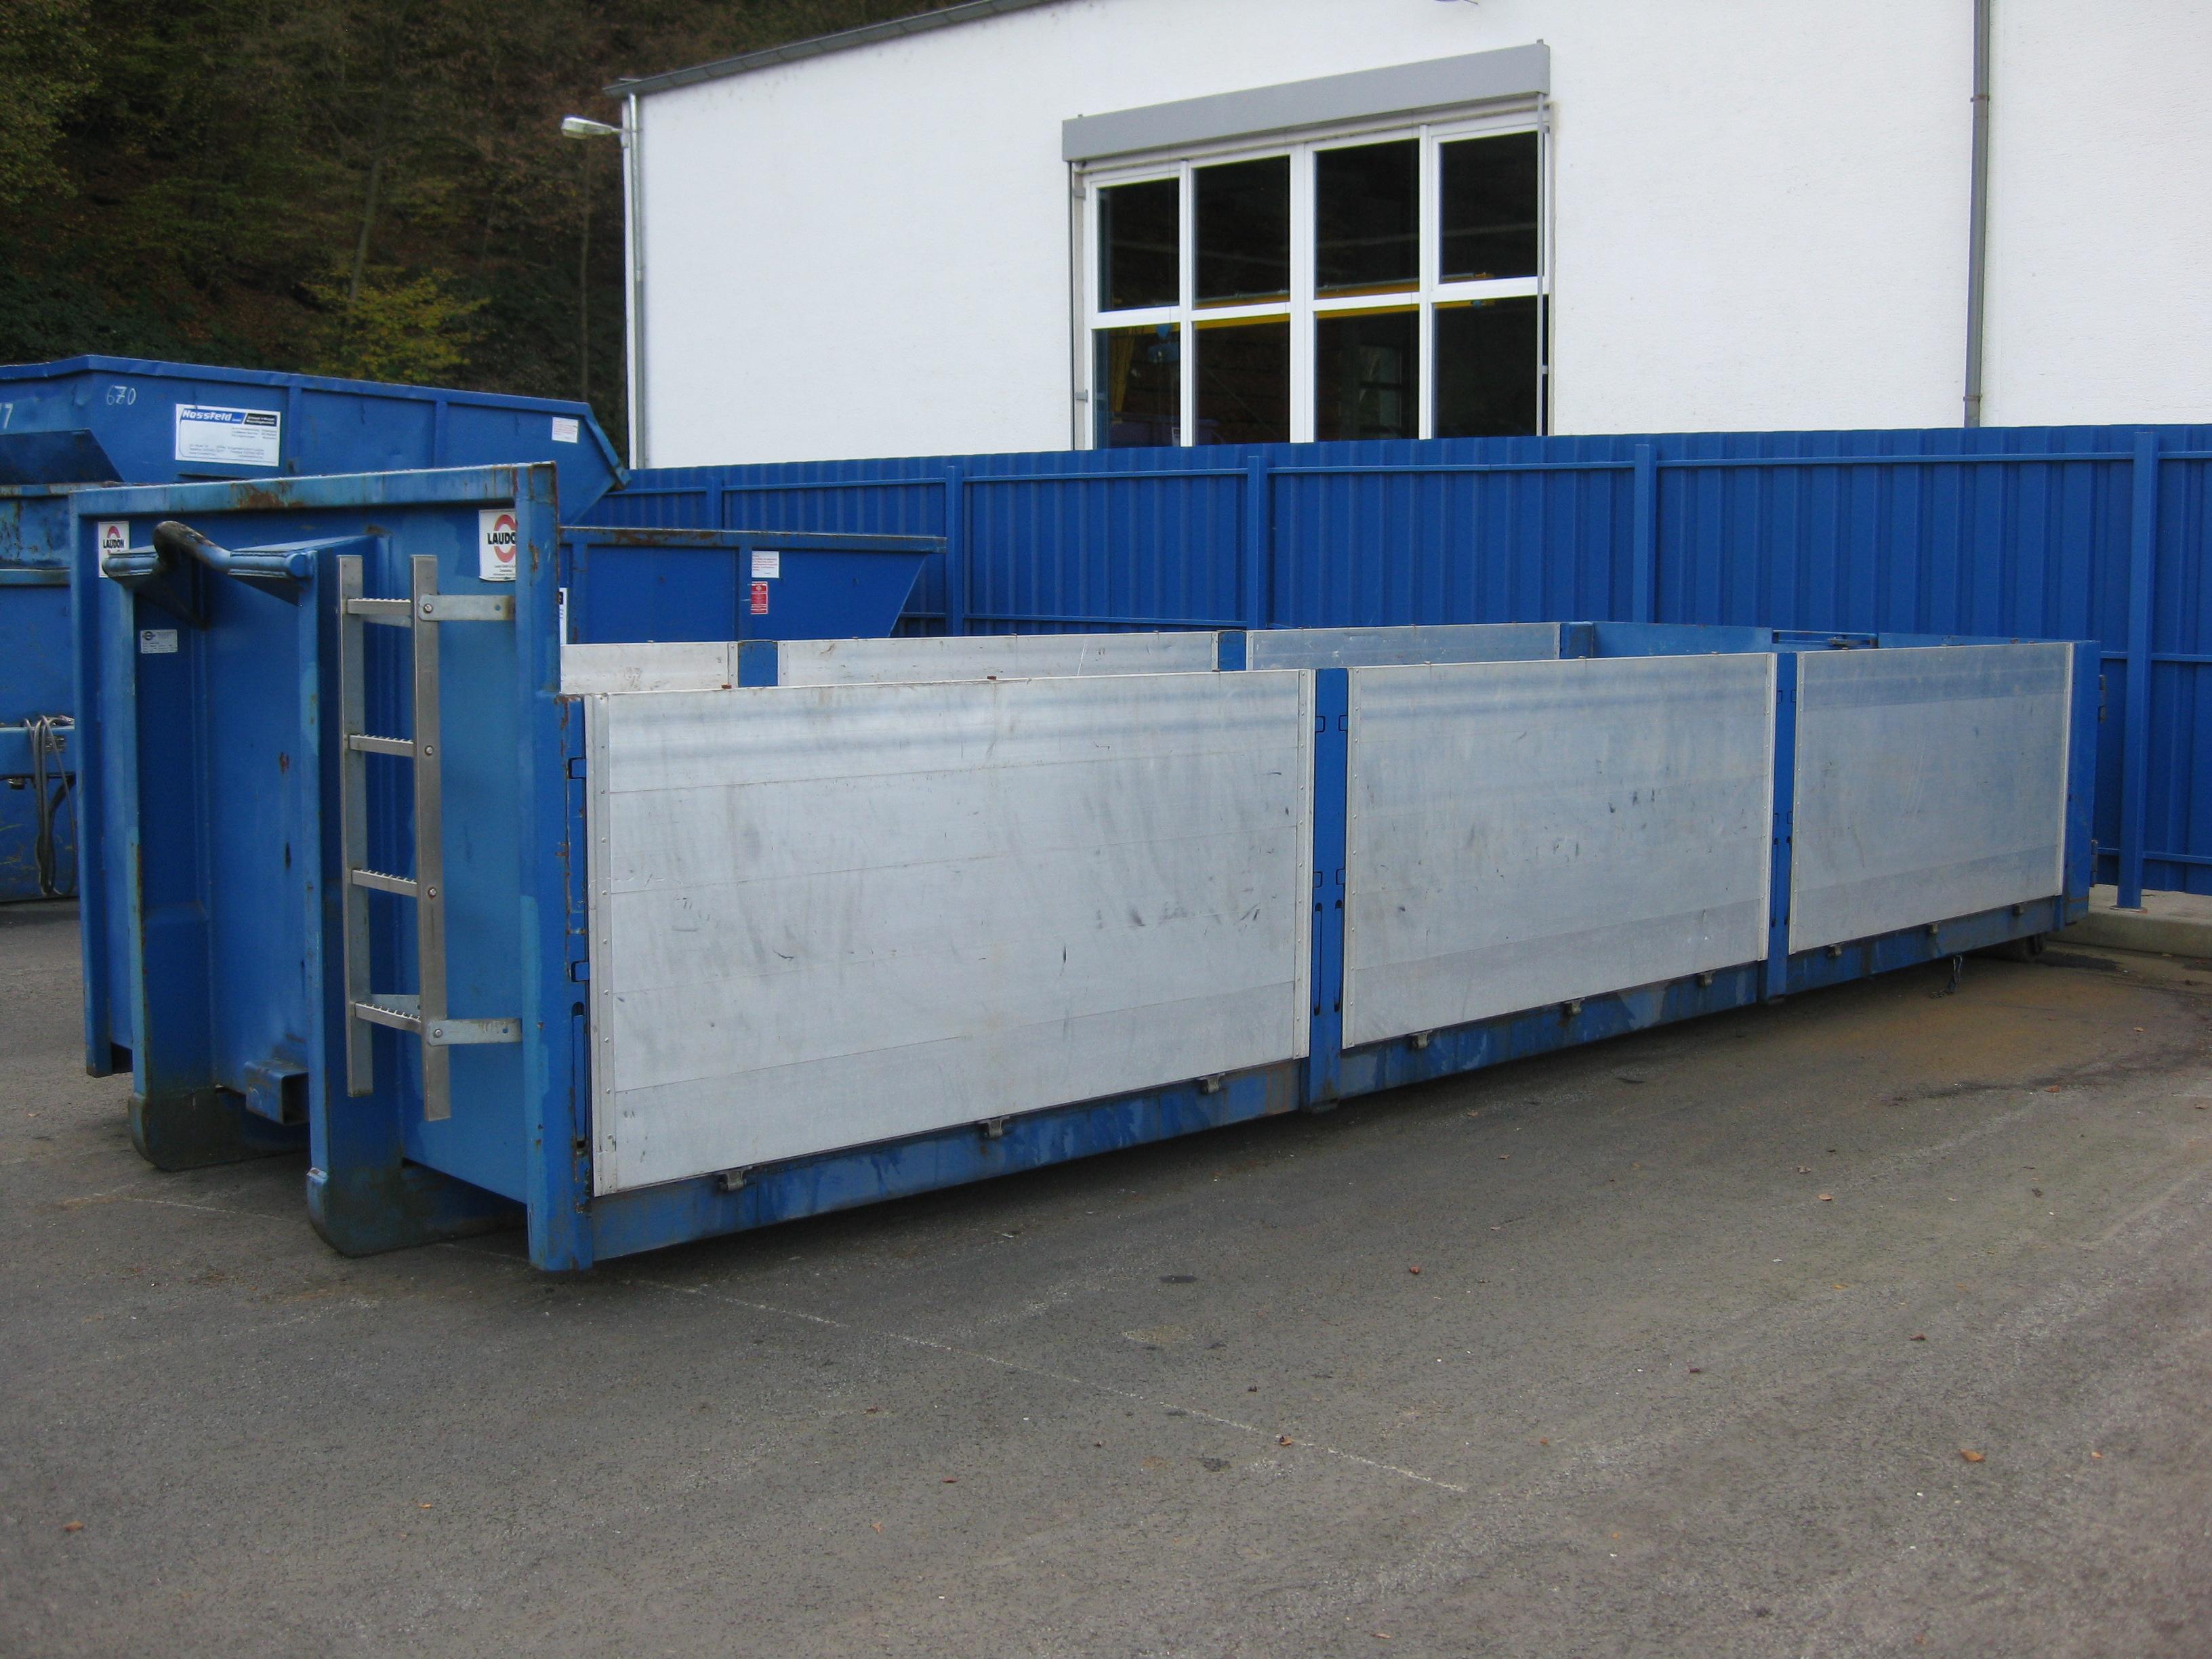 Abroller-Pritsche | Hossfeld GmbH in Engelskirchen